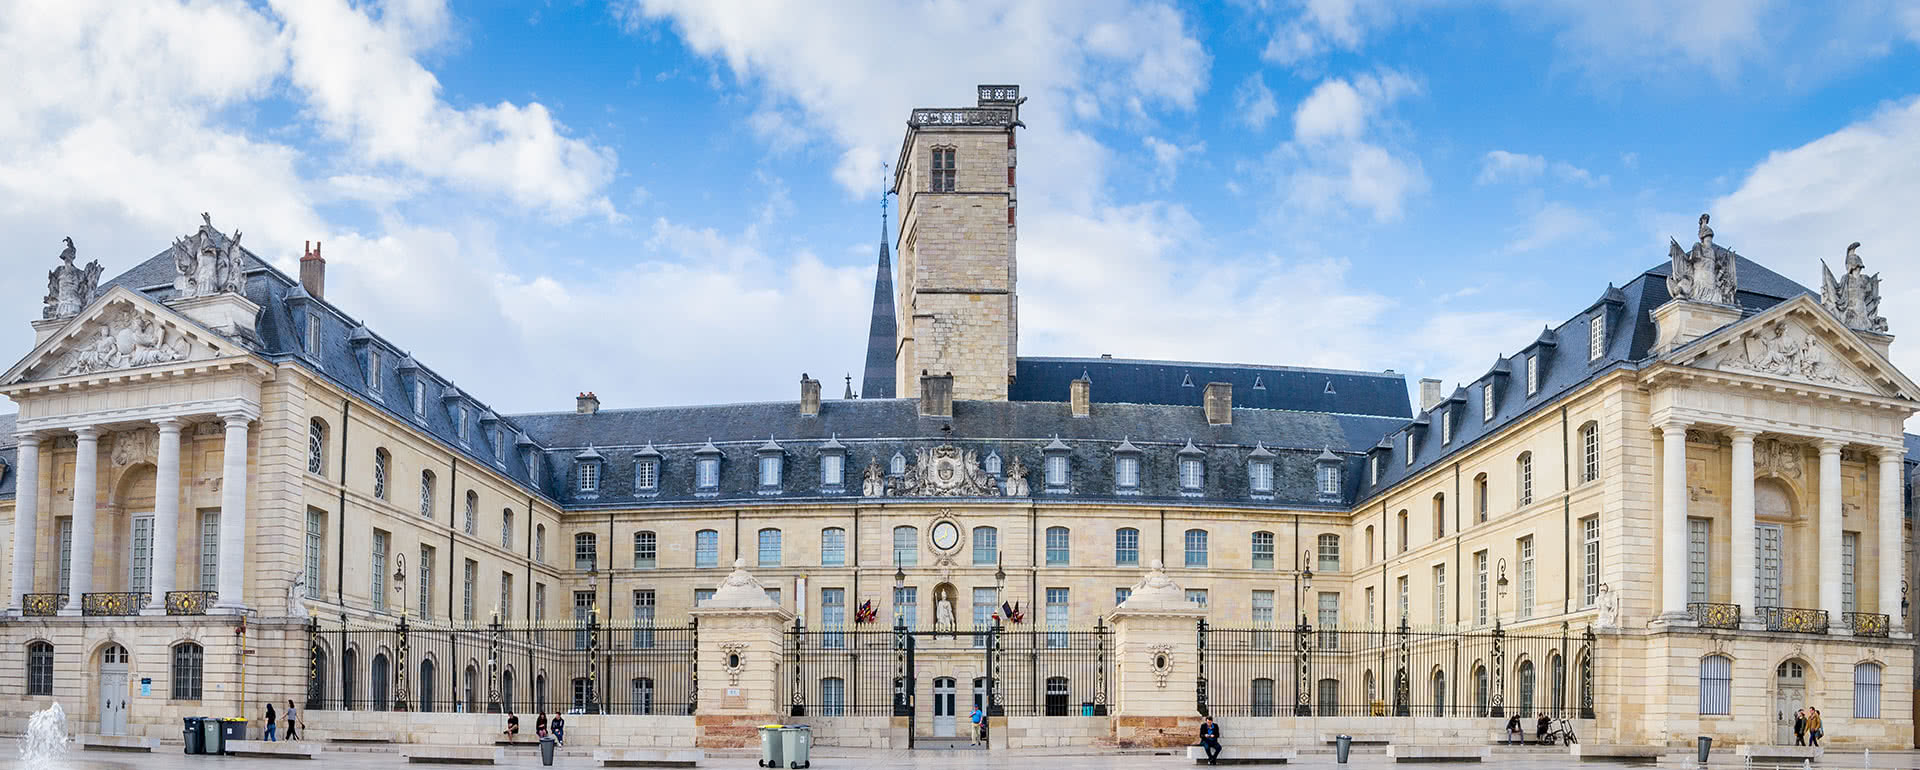 Titelbild von Dijon